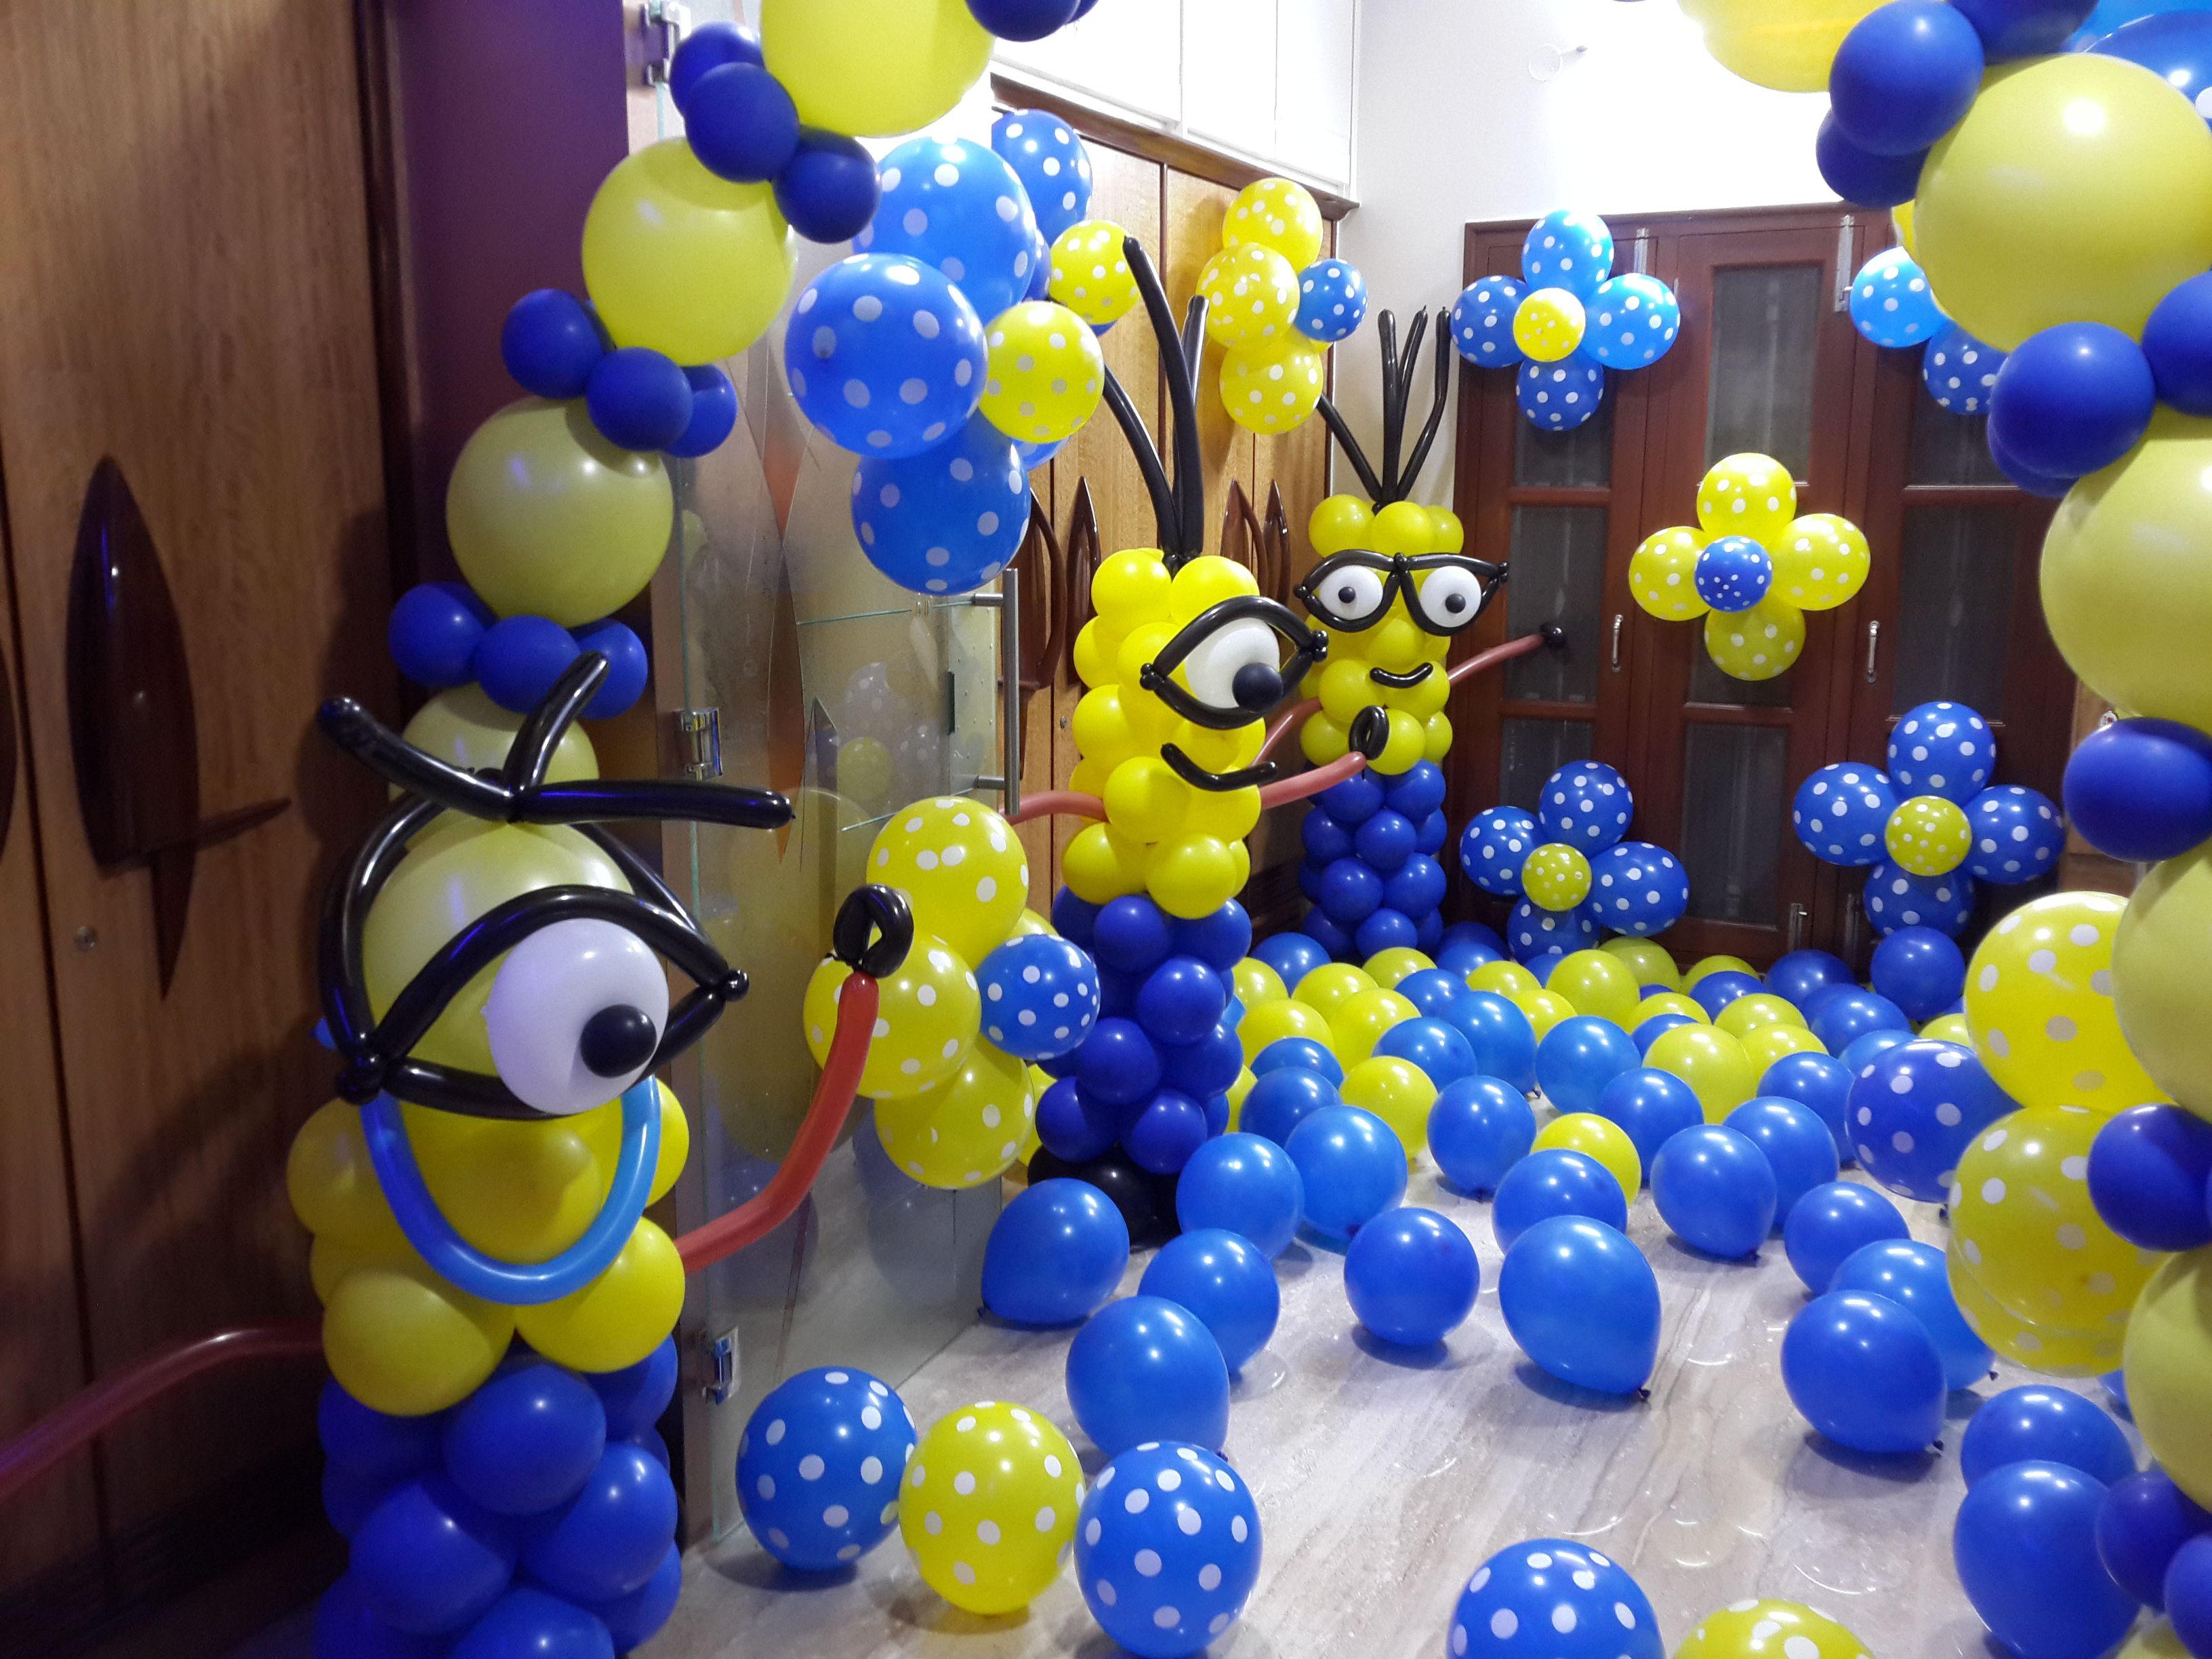 minion theme balloon decoration birthday party ideas. Black Bedroom Furniture Sets. Home Design Ideas